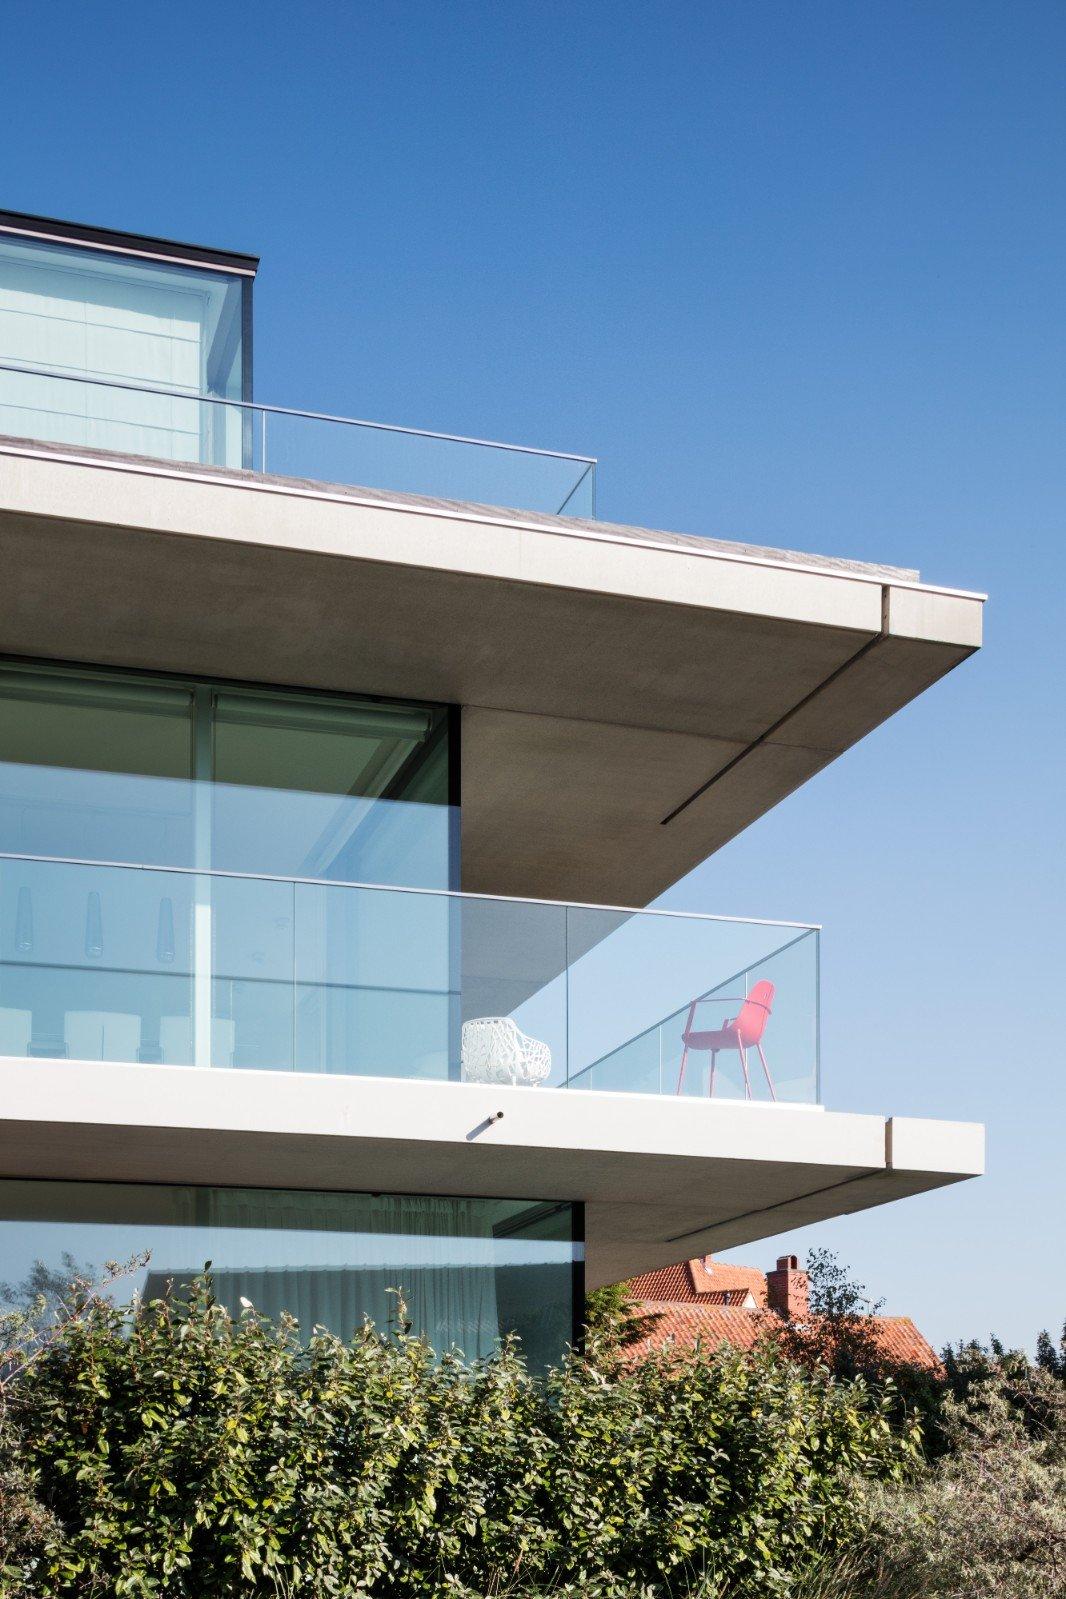 Rietveldprojects.be-Twins-Gropius-Breuer-appartement-design-architectuur-kust9